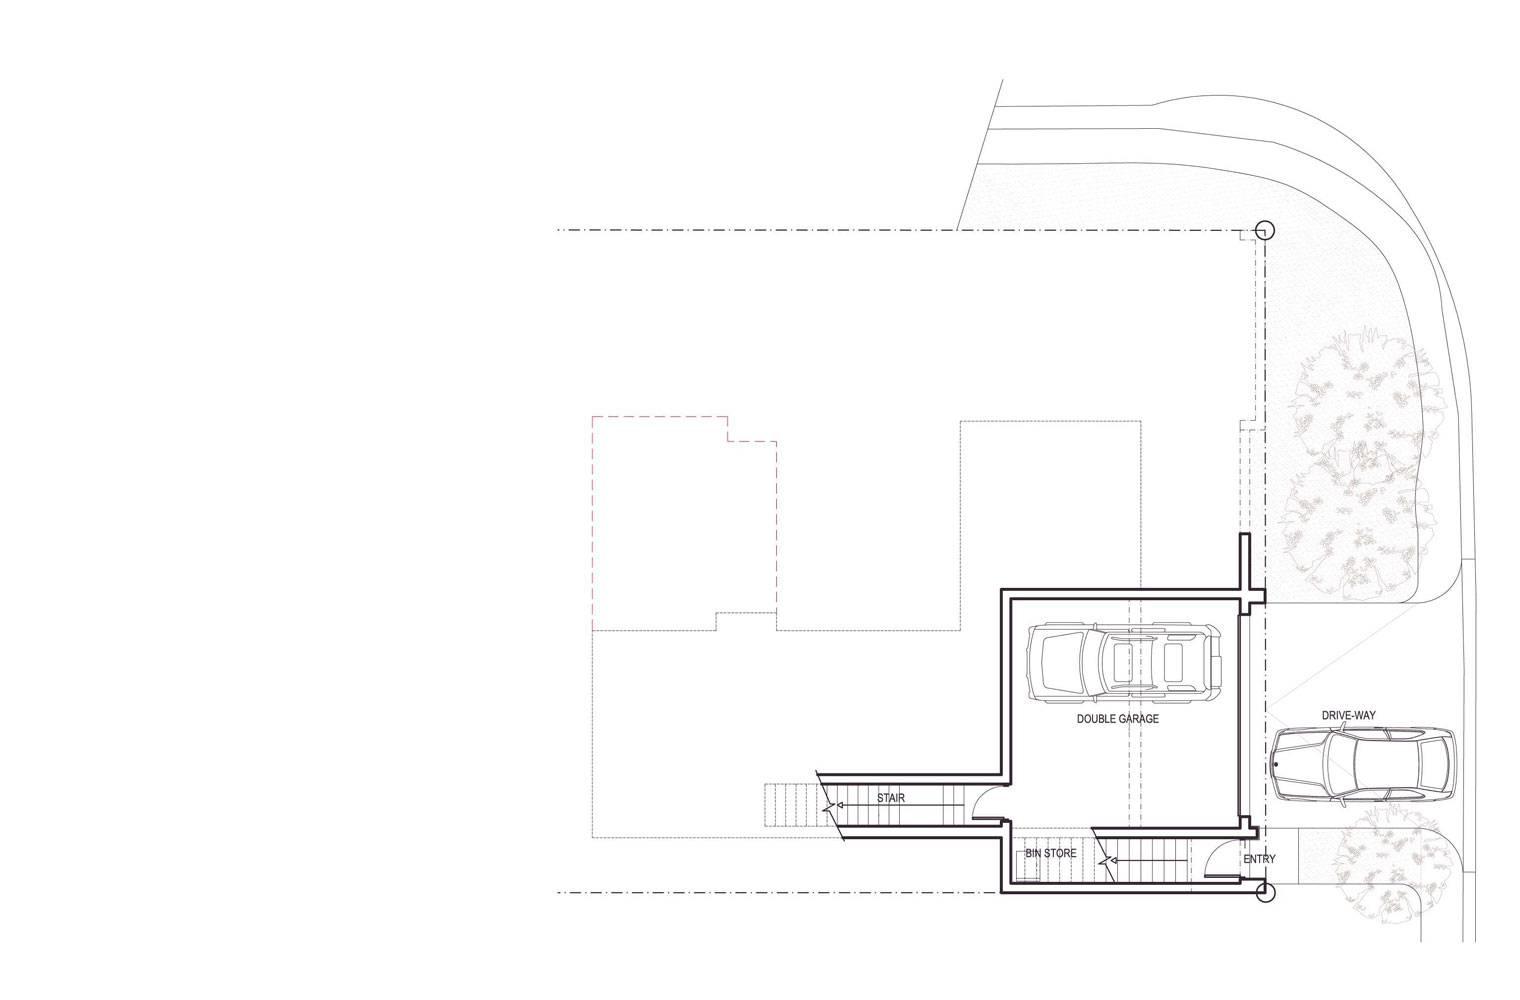 Signal Hill - Basement Plan, Unit #1